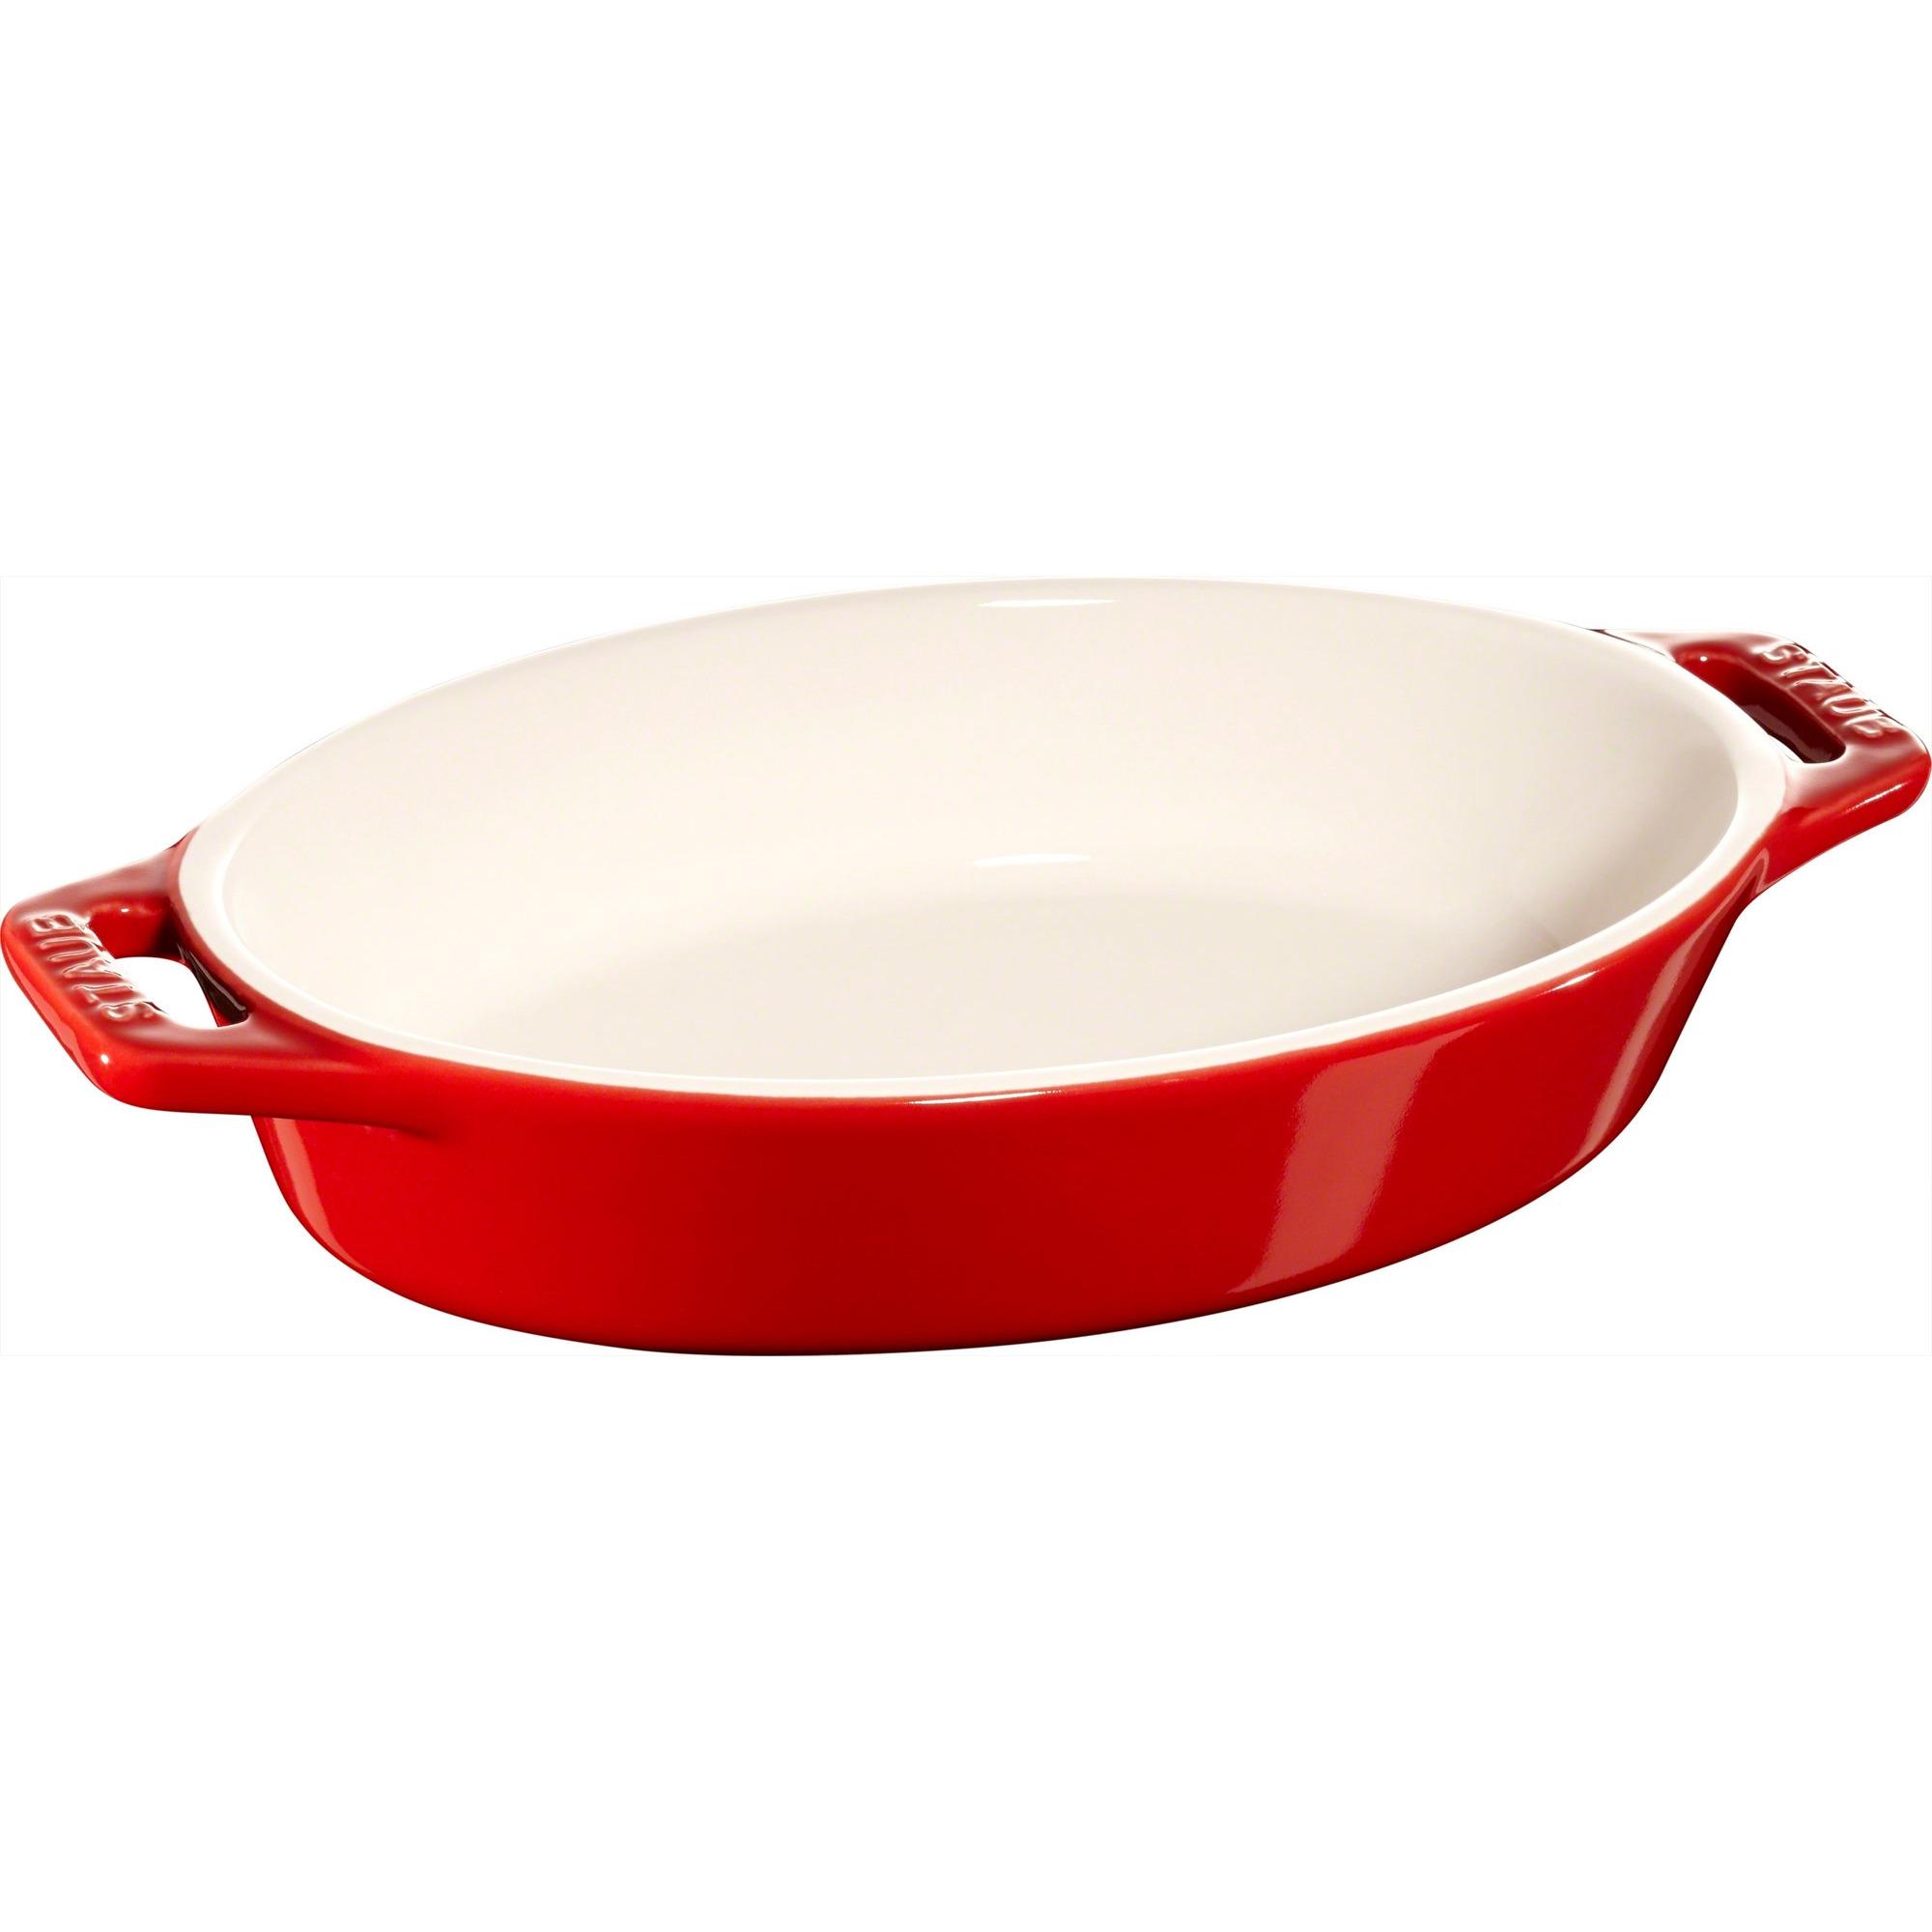 Staub Oval Form 17 cm Röd